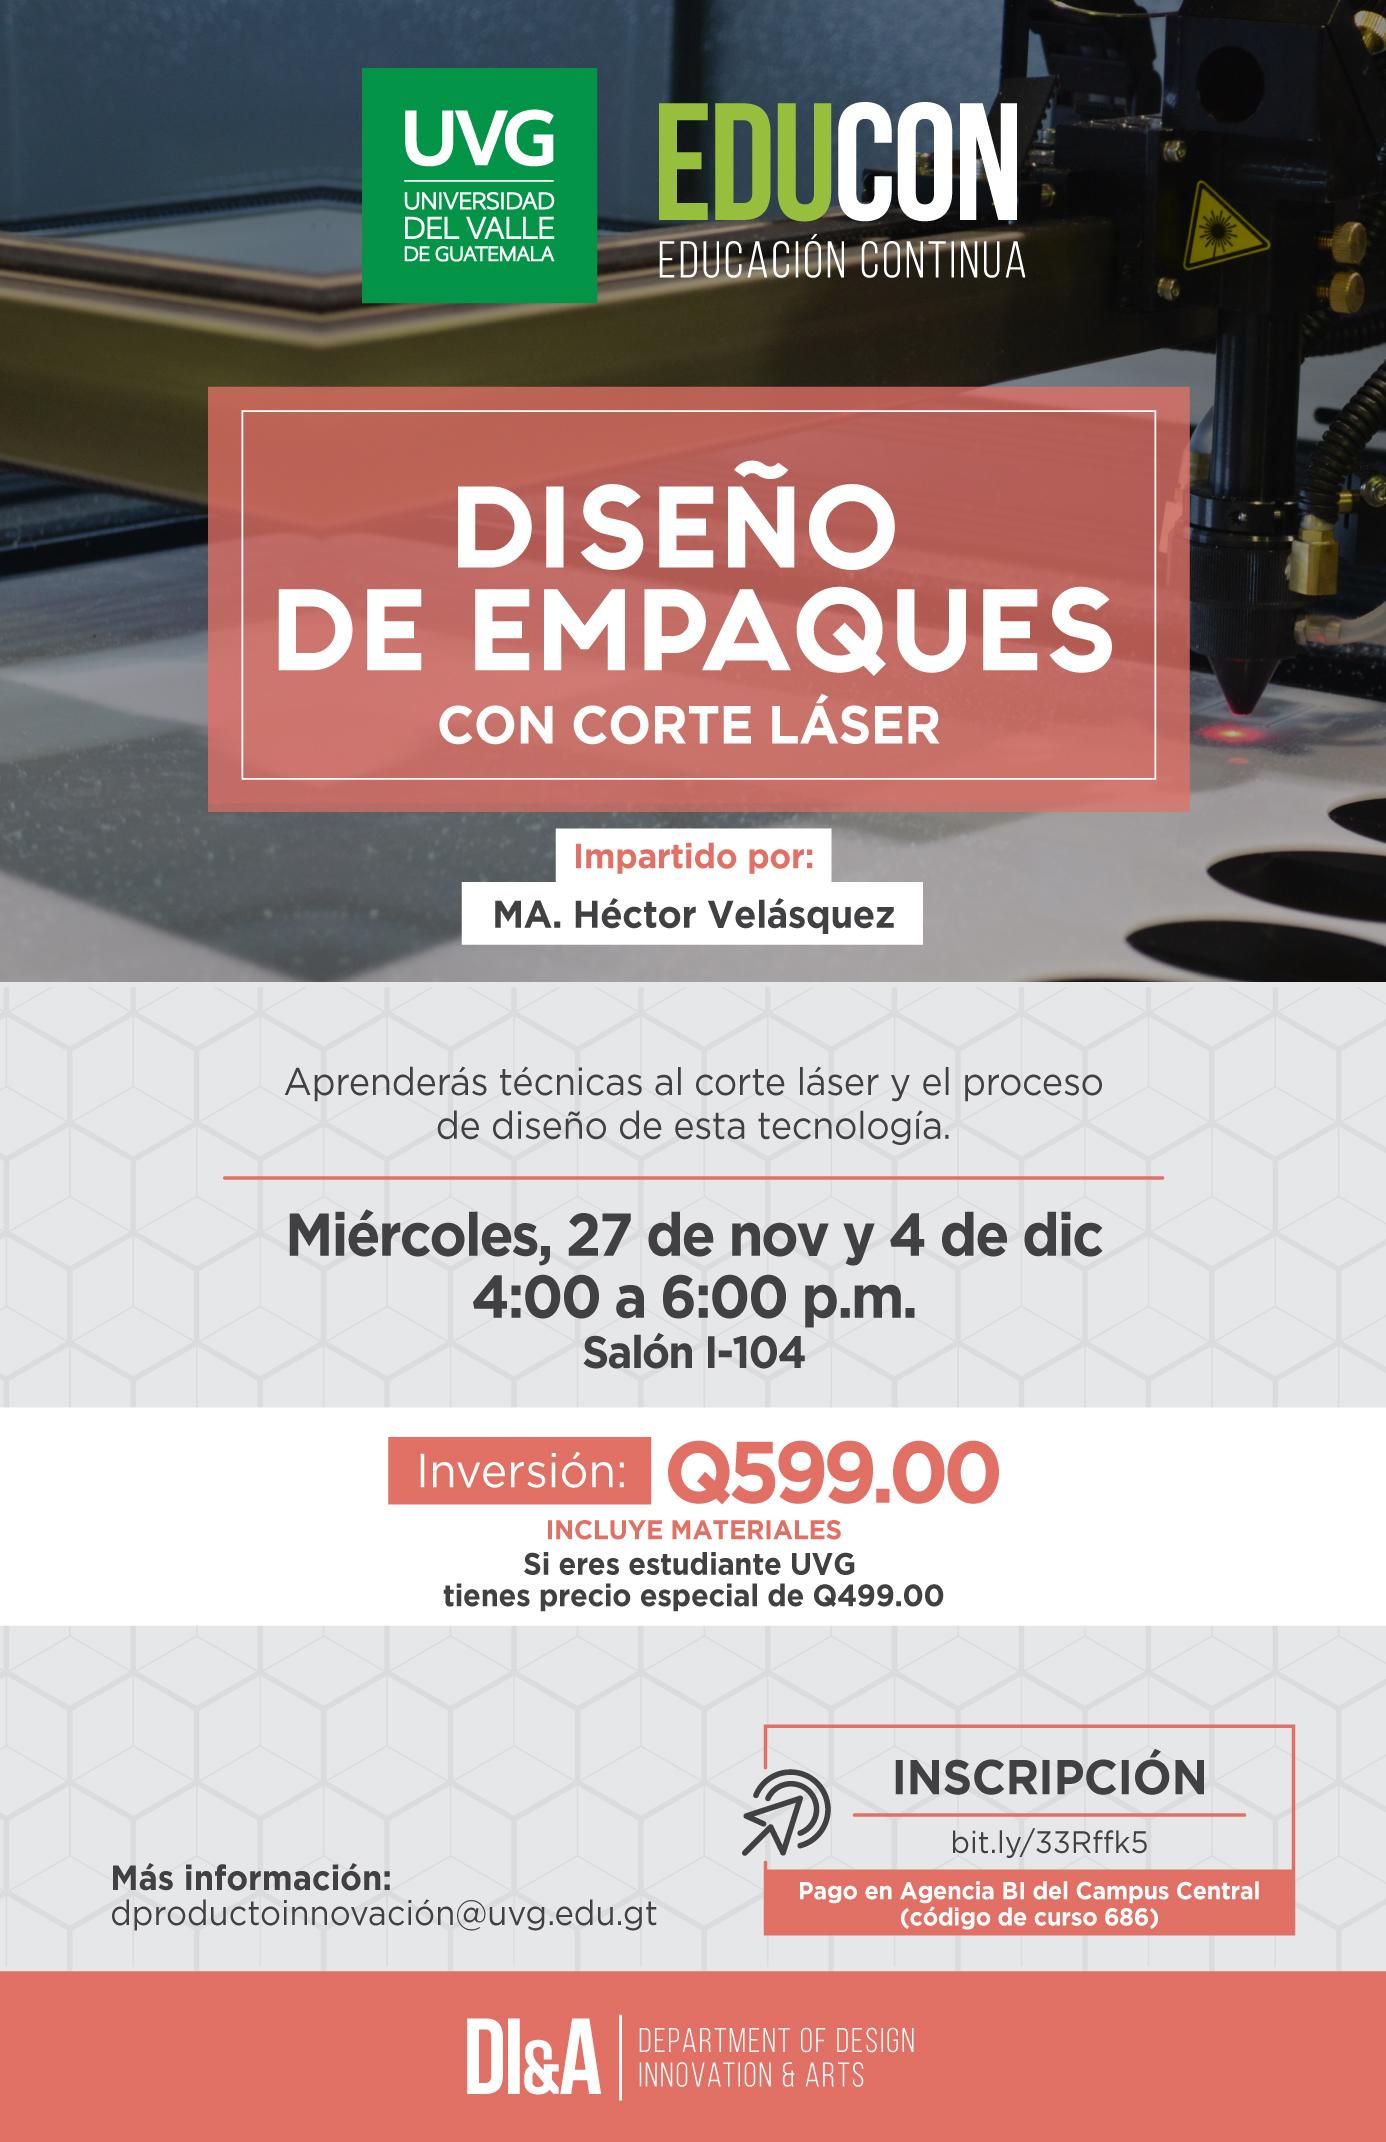 DISEÑO DE EMPAQUES CON CORTE LÁSER